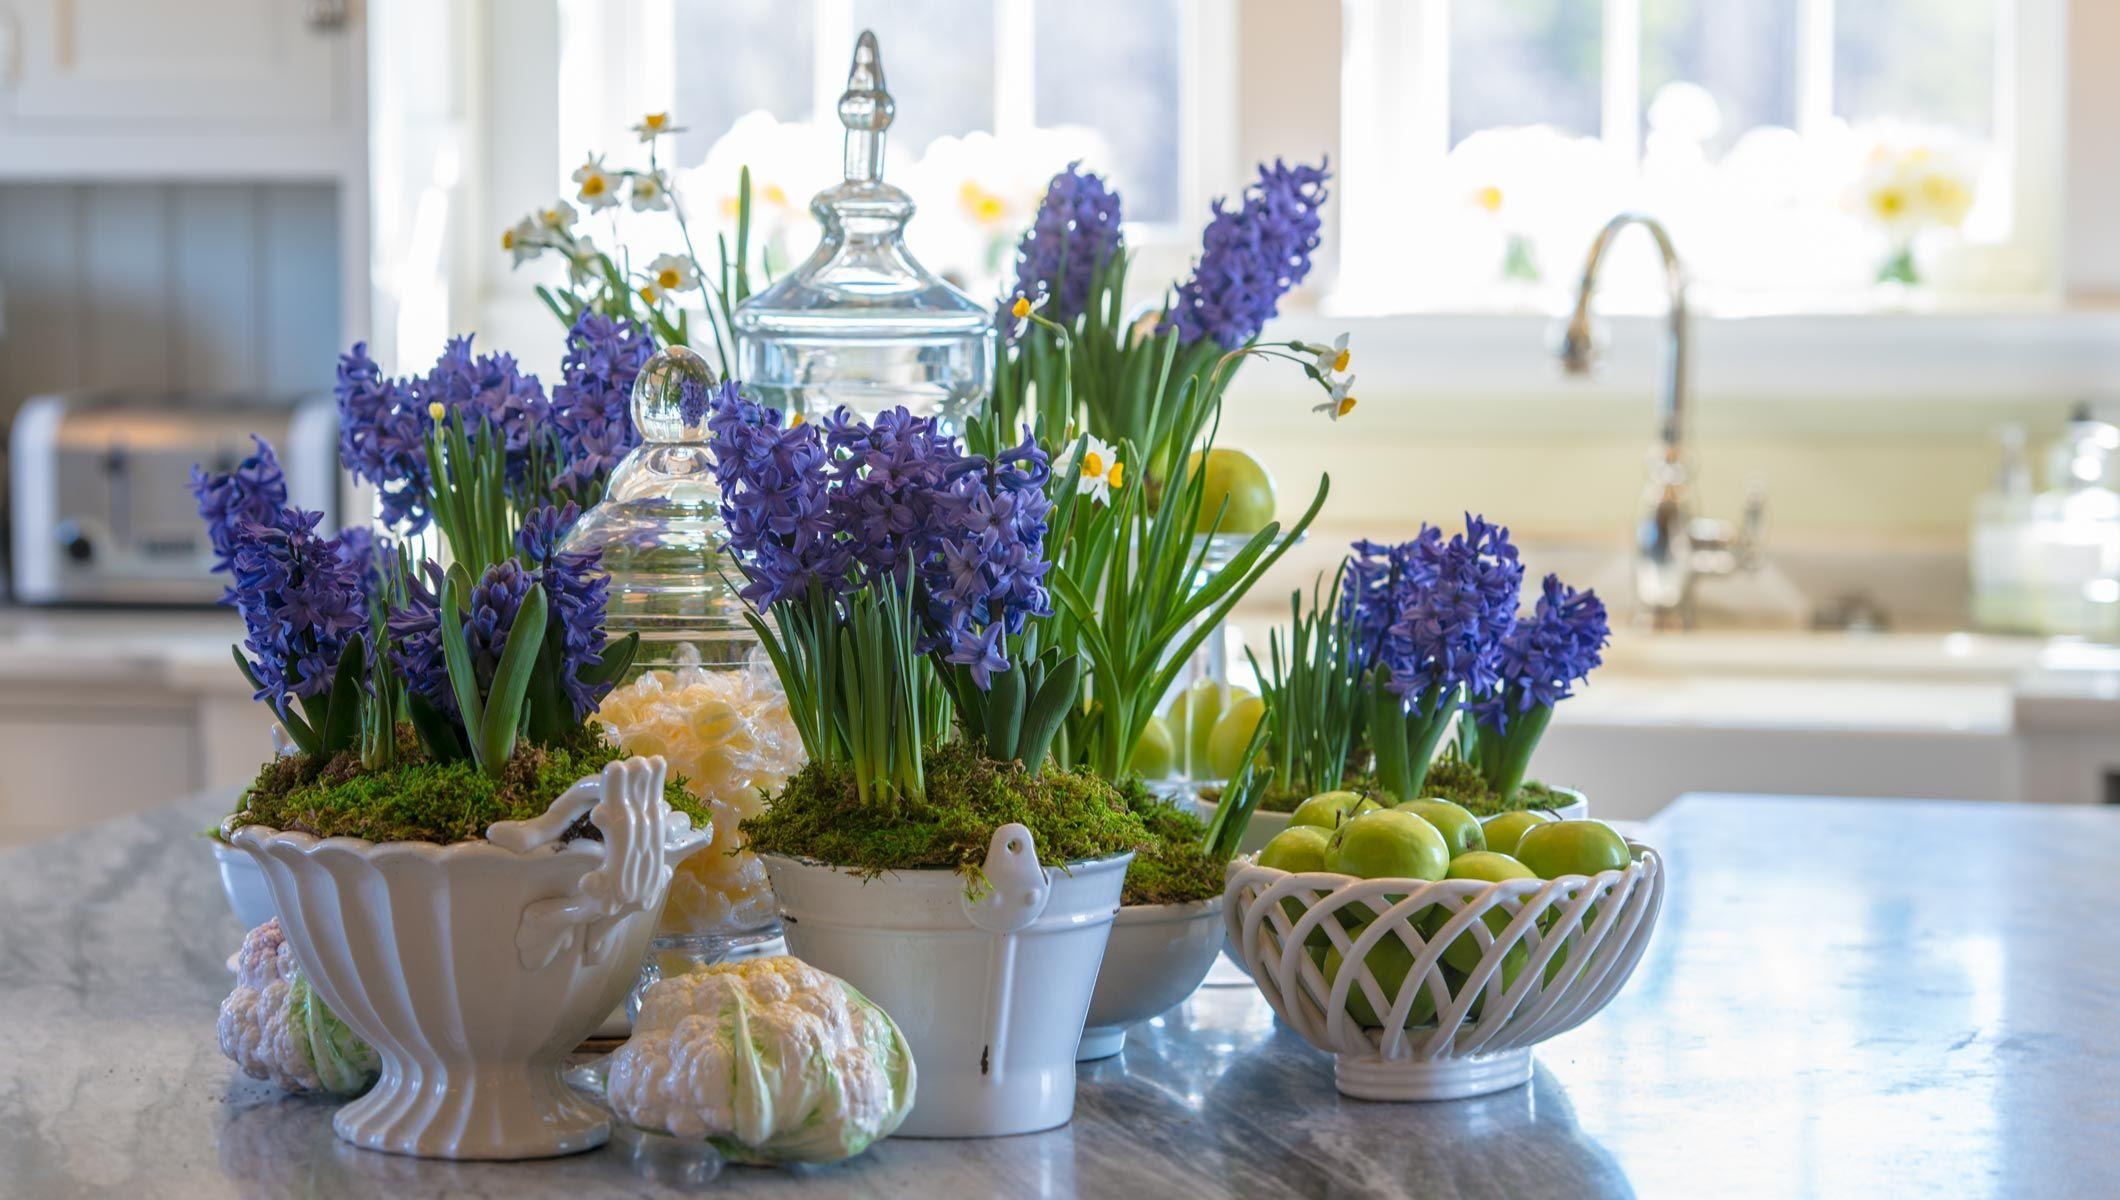 How to Grow Hyacinths Indoors   Hyacinth flowers, Indoor ...